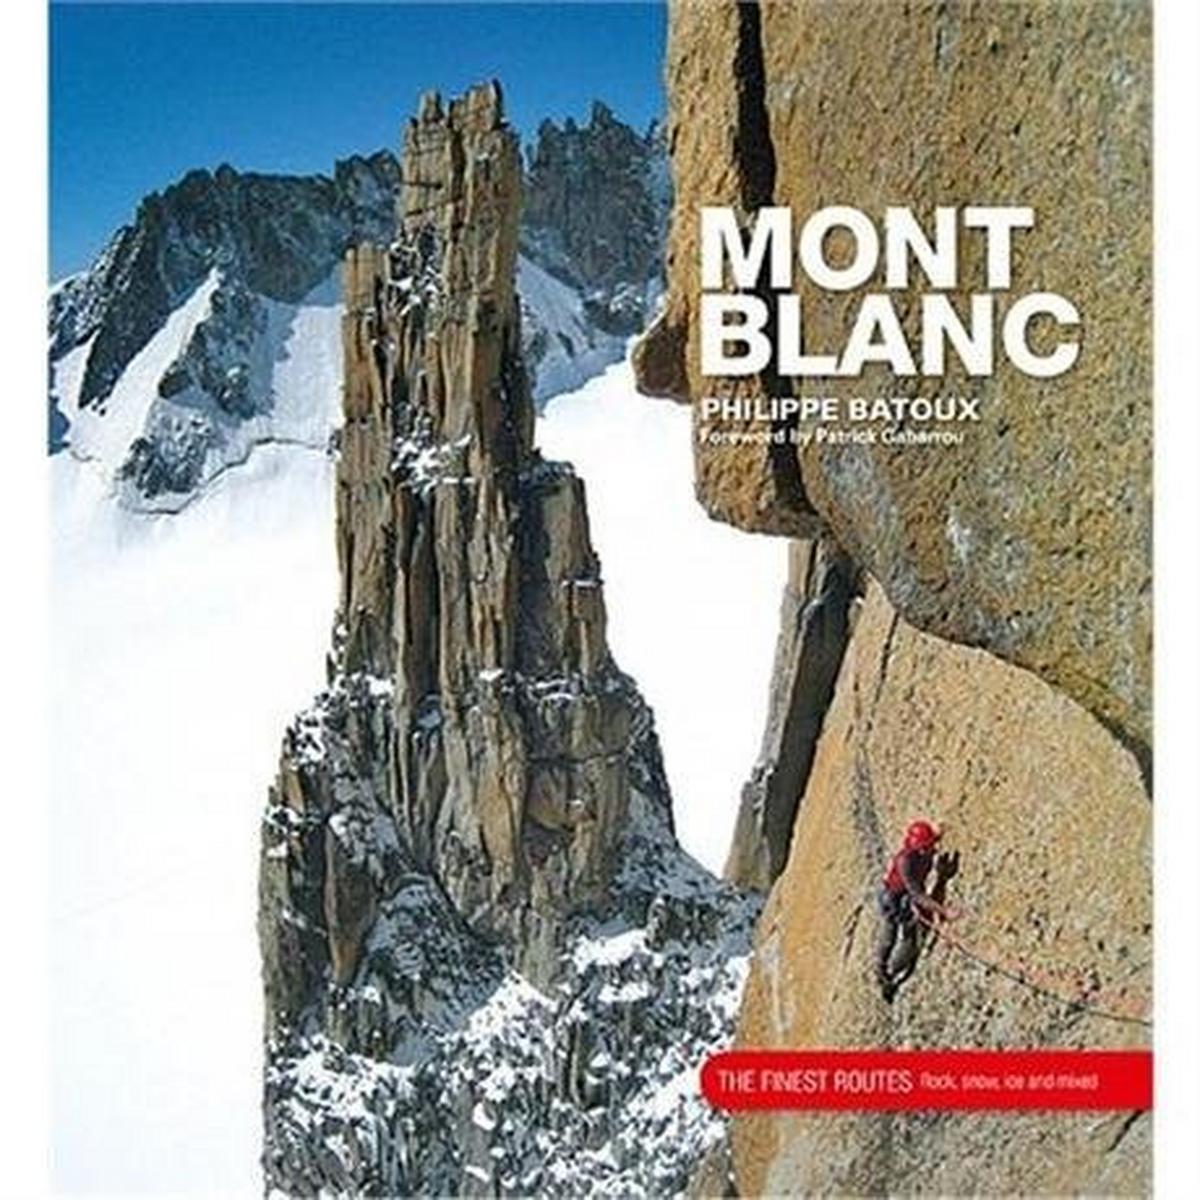 Vertebrate Publishing Book: Mont Blanc : The Finest Routes